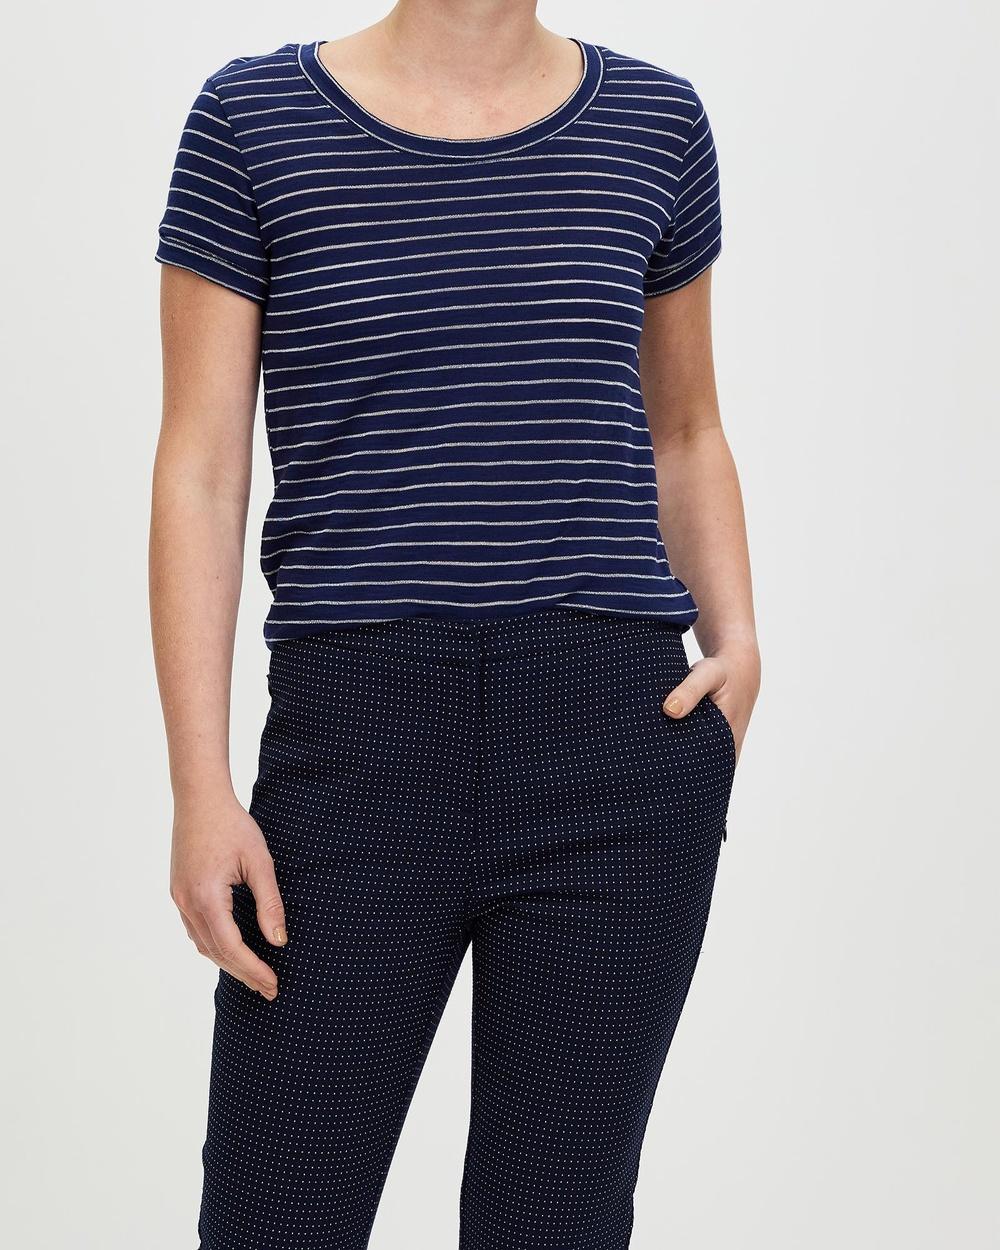 Marcs Shimmer Stripe Tee T-Shirts & Singlets Navy Australia